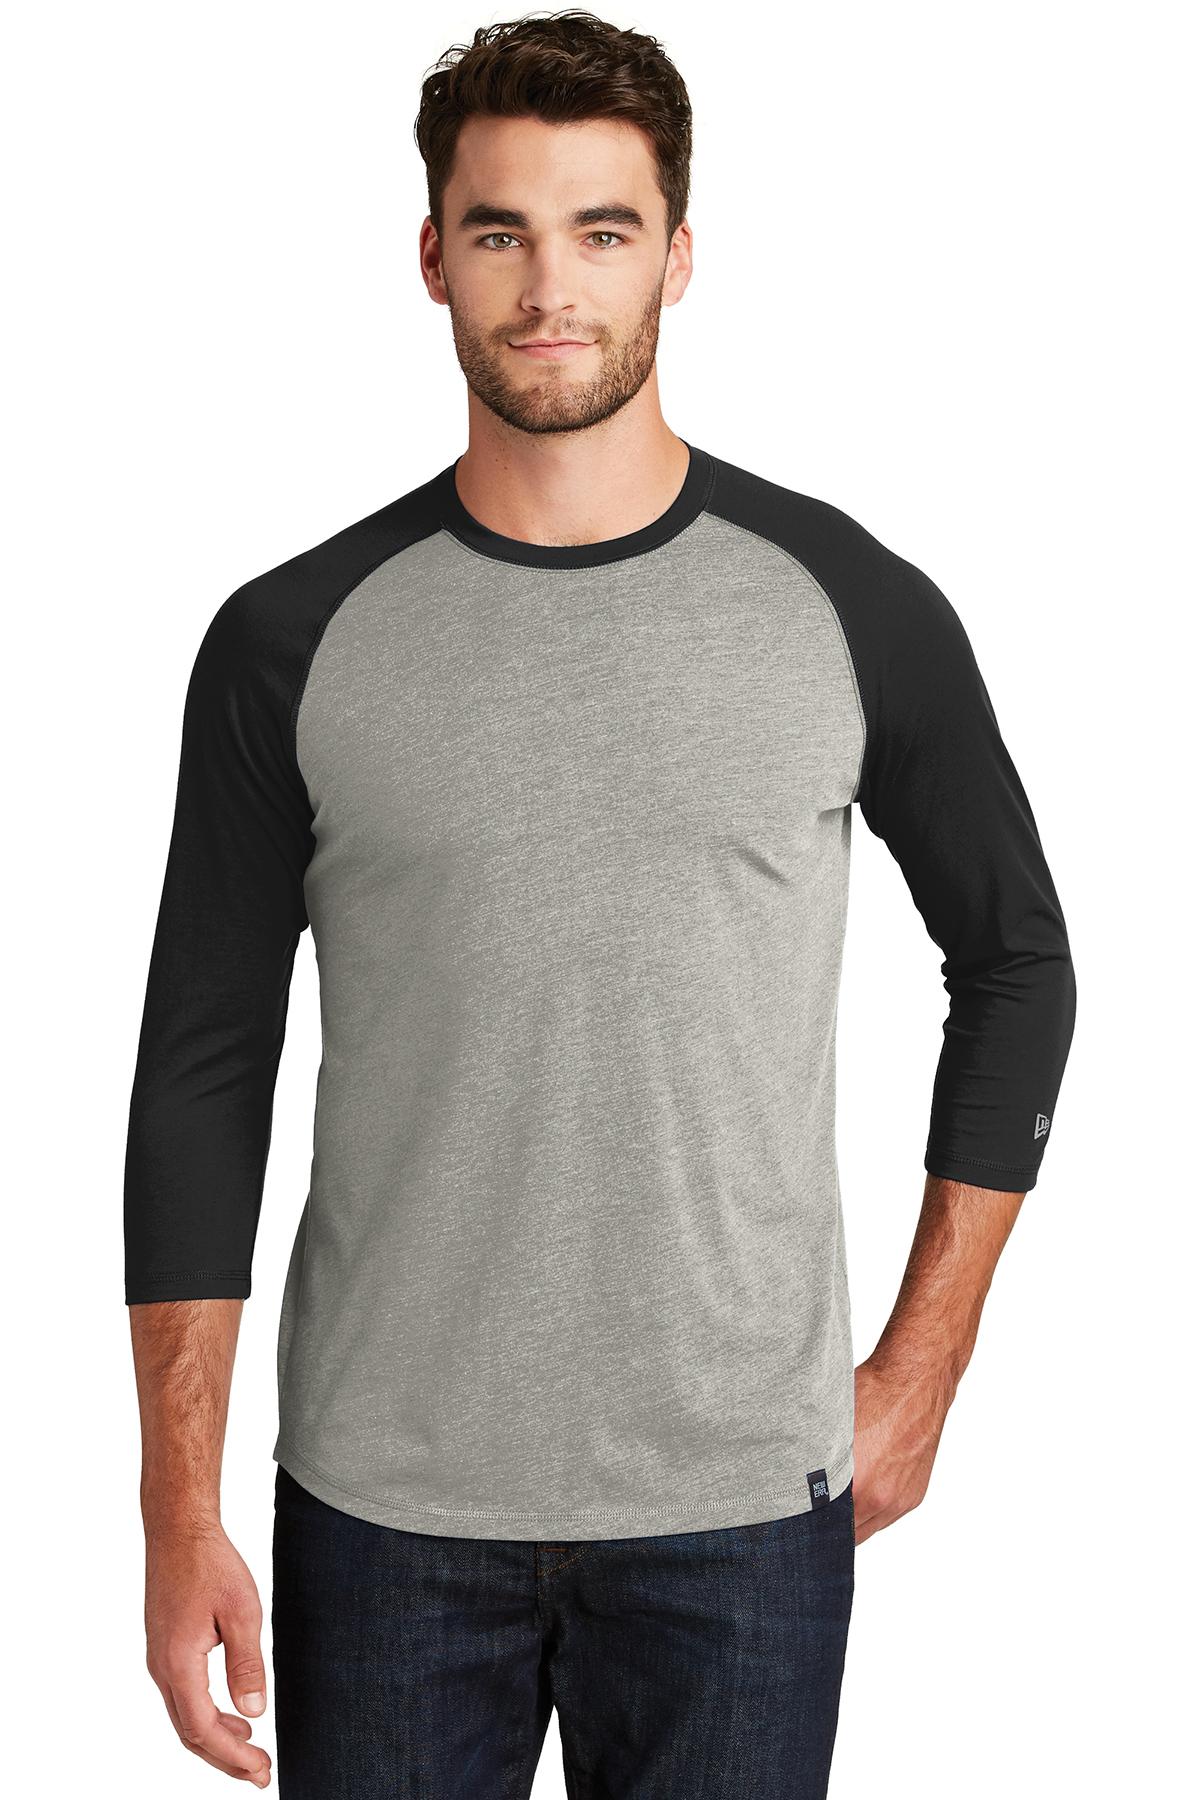 90b2a5e3 New Era® Heritage Blend 3/4-Sleeve Baseball Raglan Tee | Fashion ...